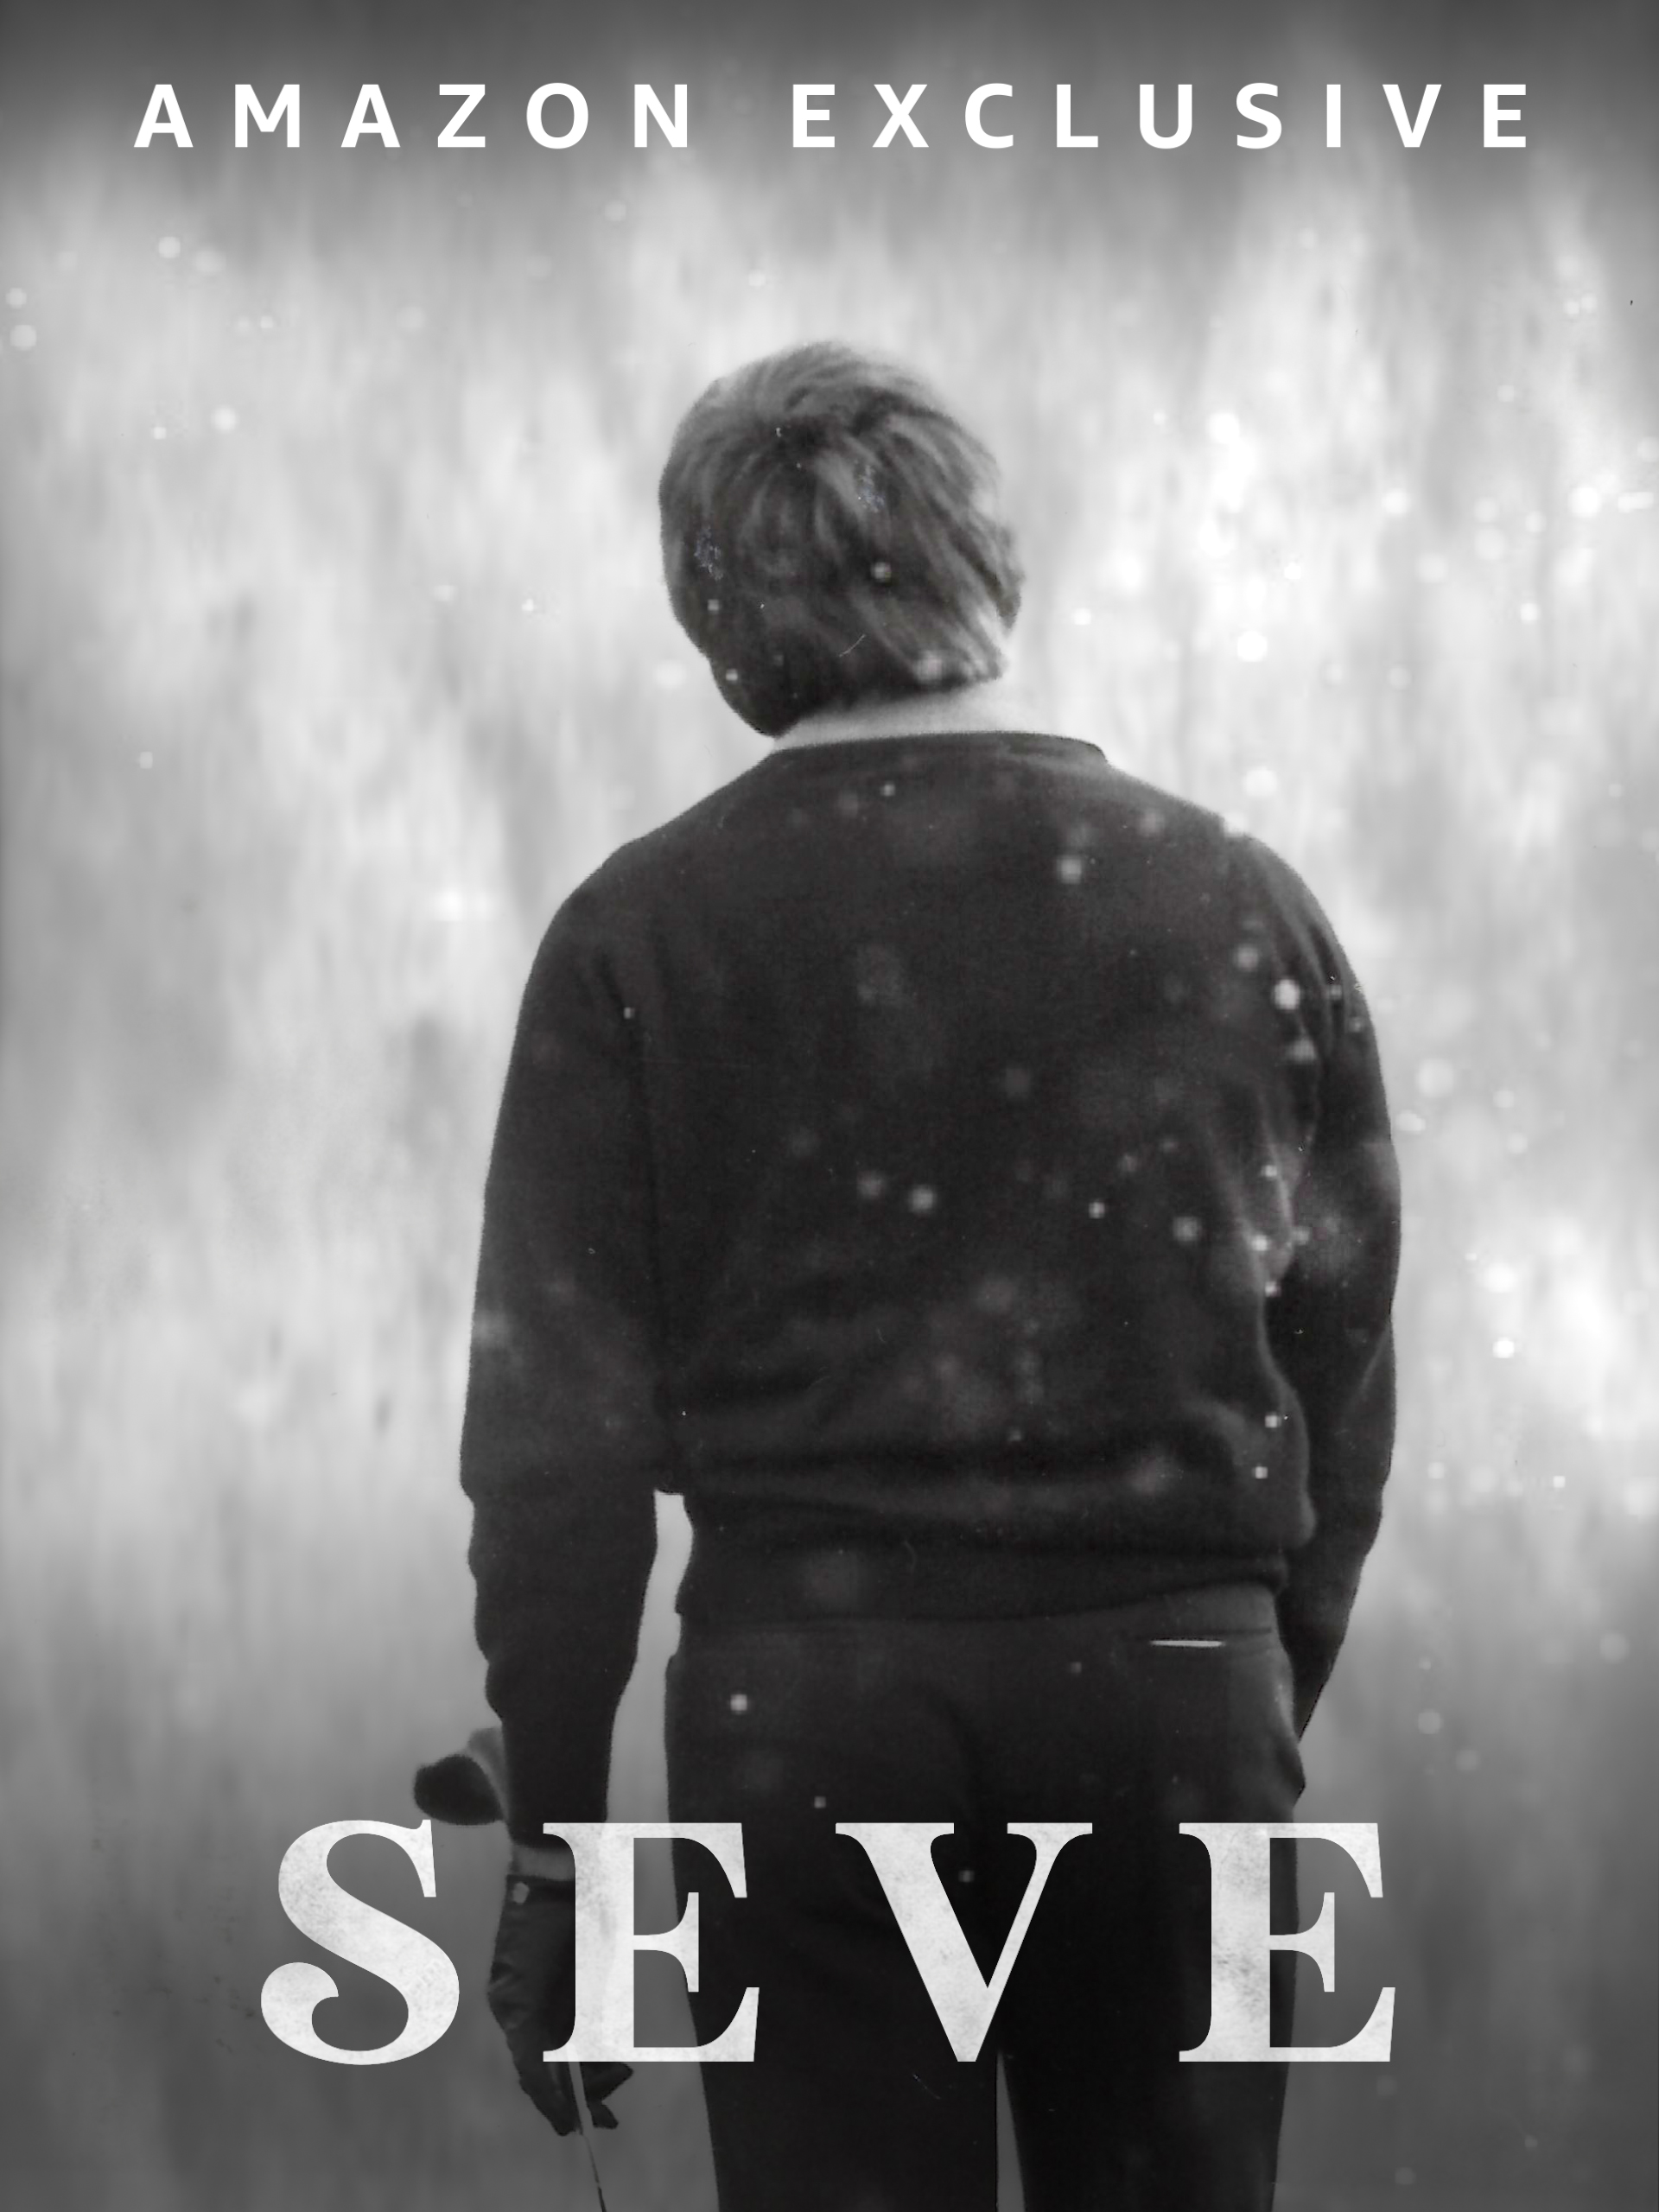 Seve (documental de Amazon Prime Video, 2021)